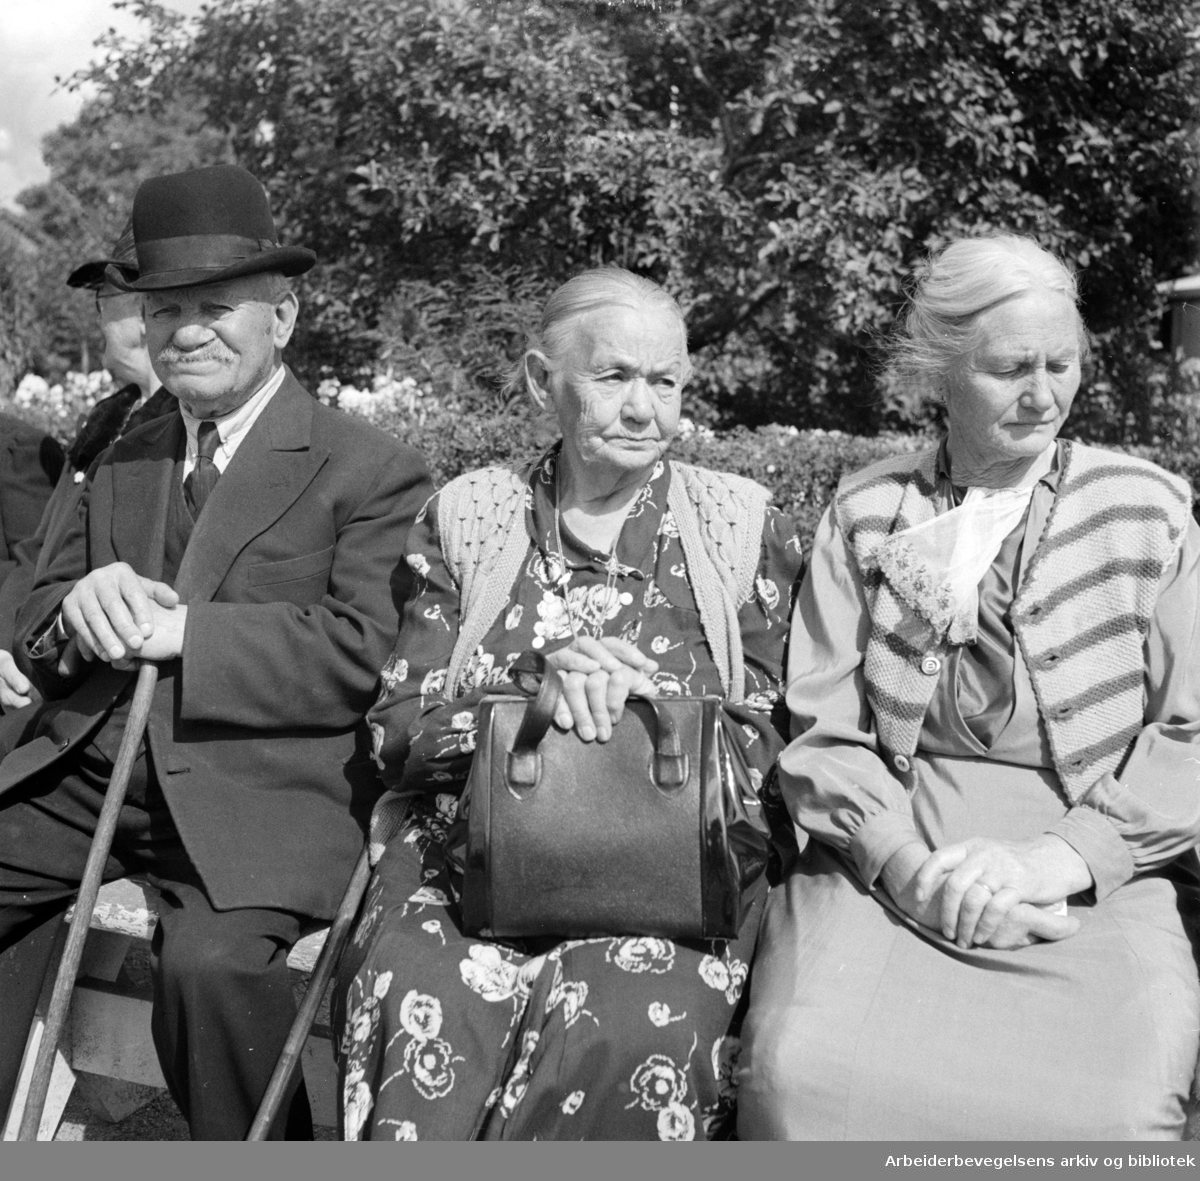 Tøyen Hagekoloni. August 1948